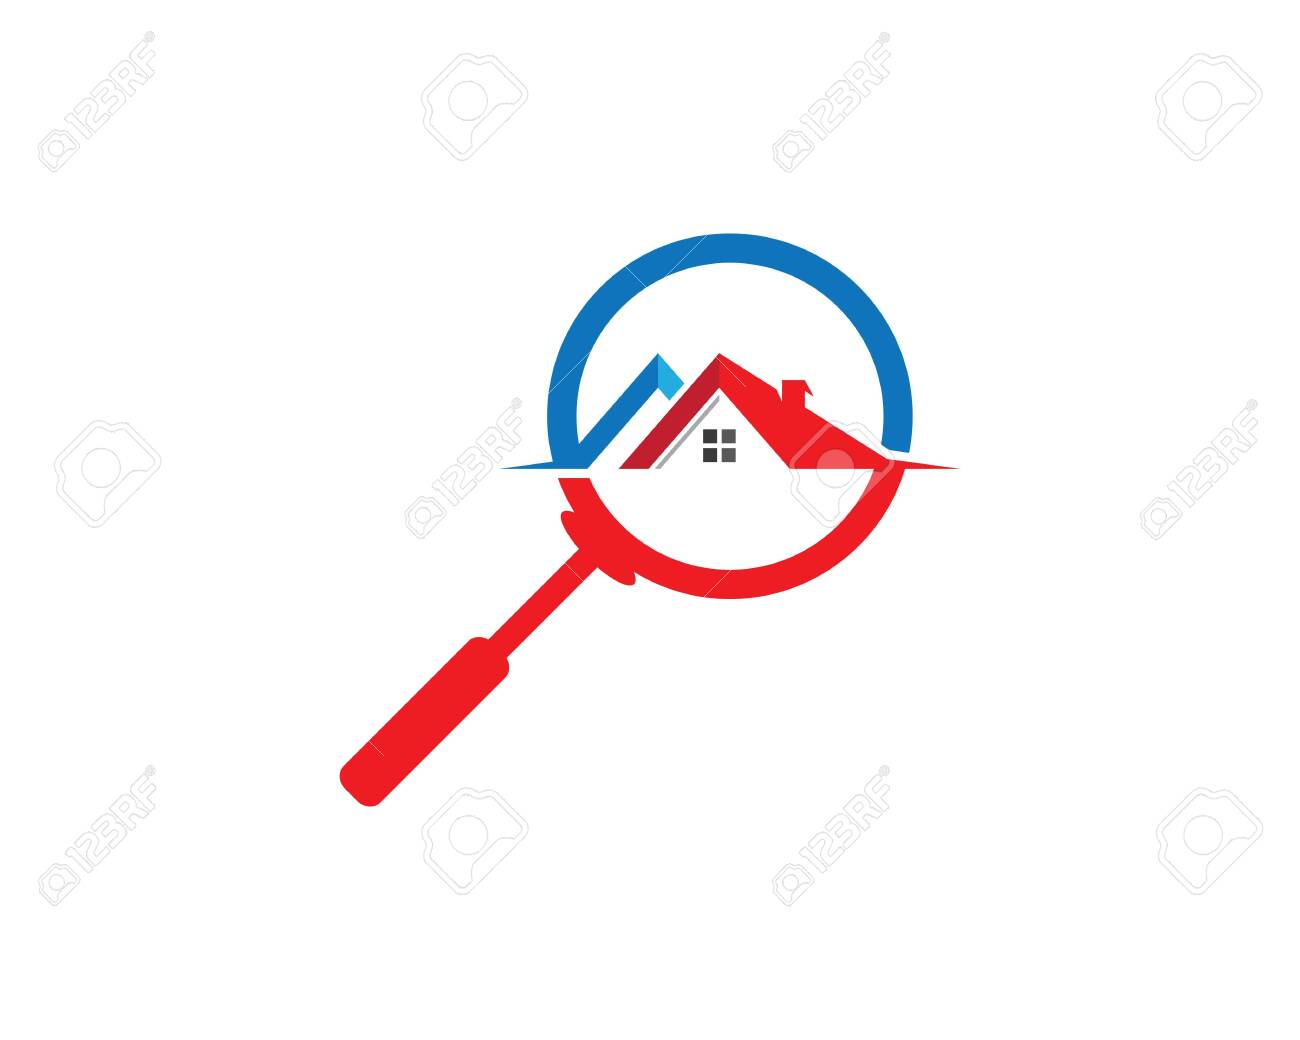 House symbol vector illustration design - 144494829